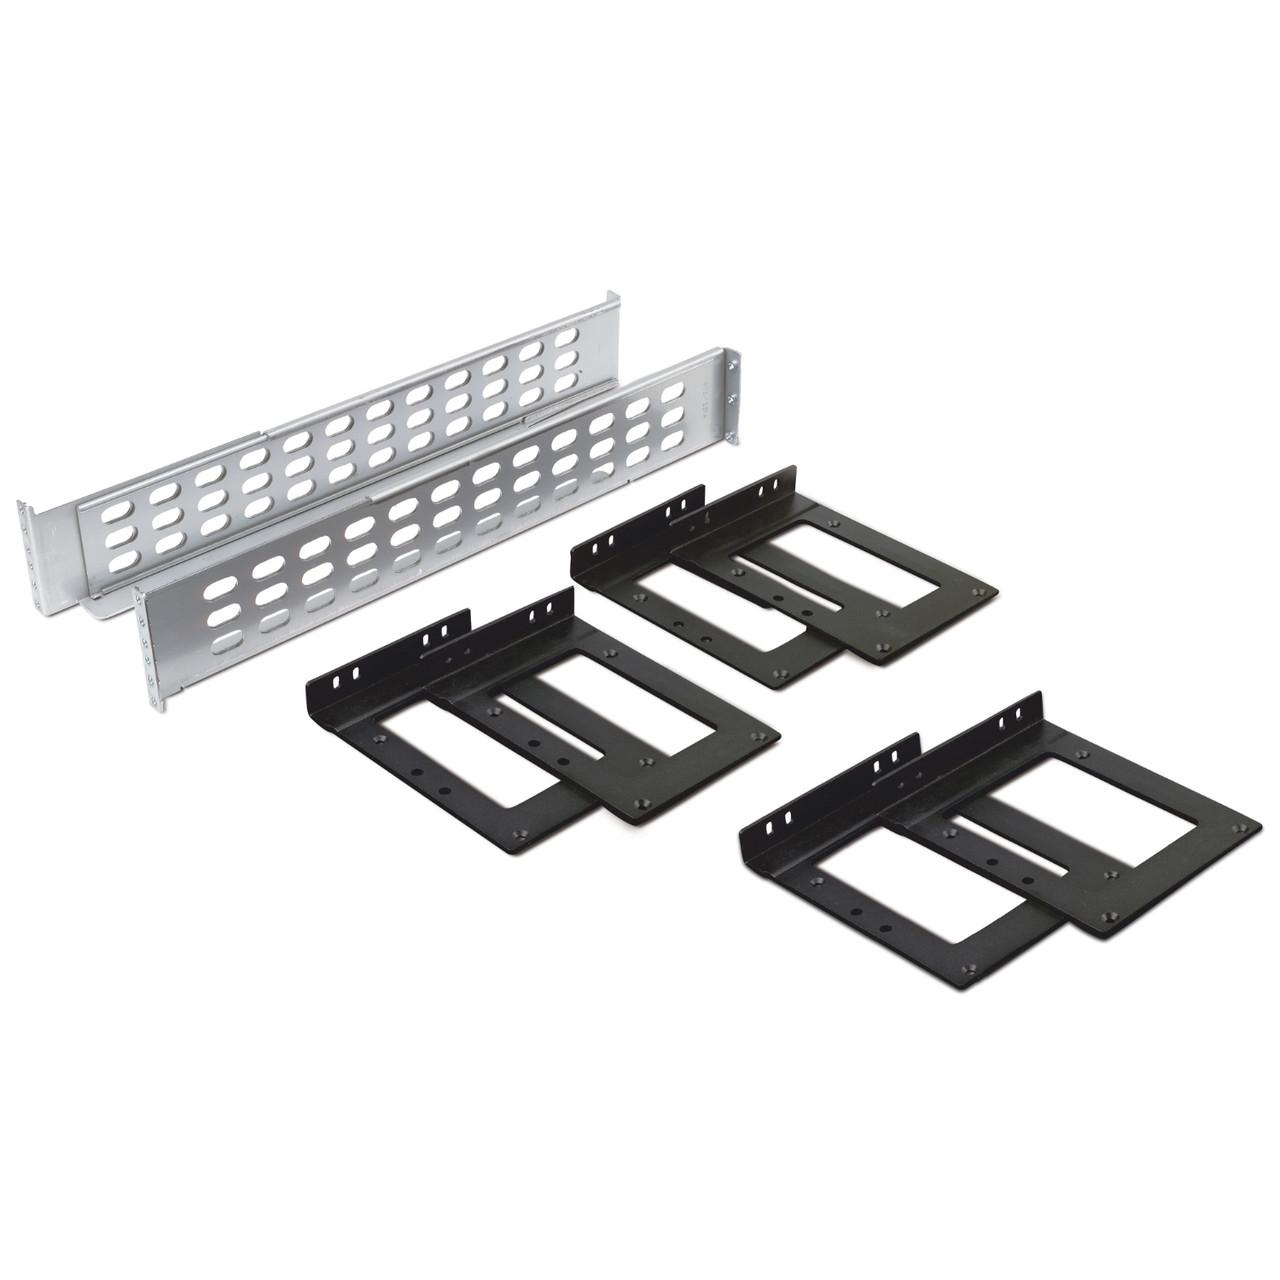 APC SRTRK2 Комплект направляющих для Smart-UPS SRT 5/6/8/10 кВА, Smart-UPS SRT 19